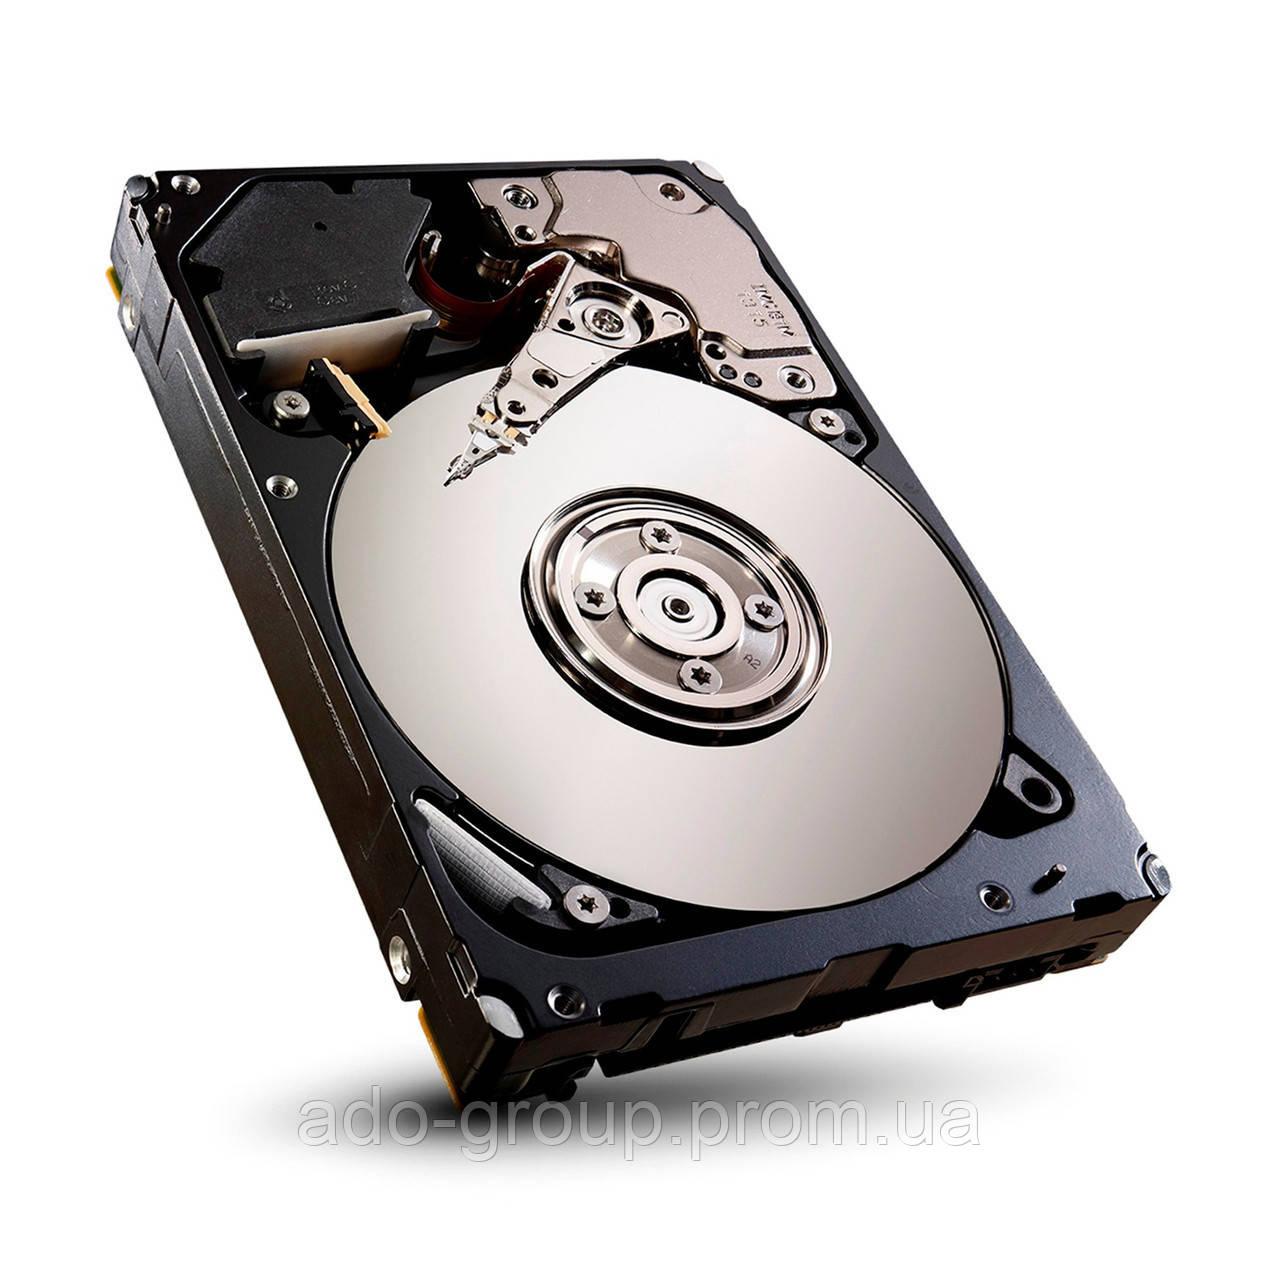 "W345K Жесткий диск Dell 73GB SAS 15K  2.5"" +"